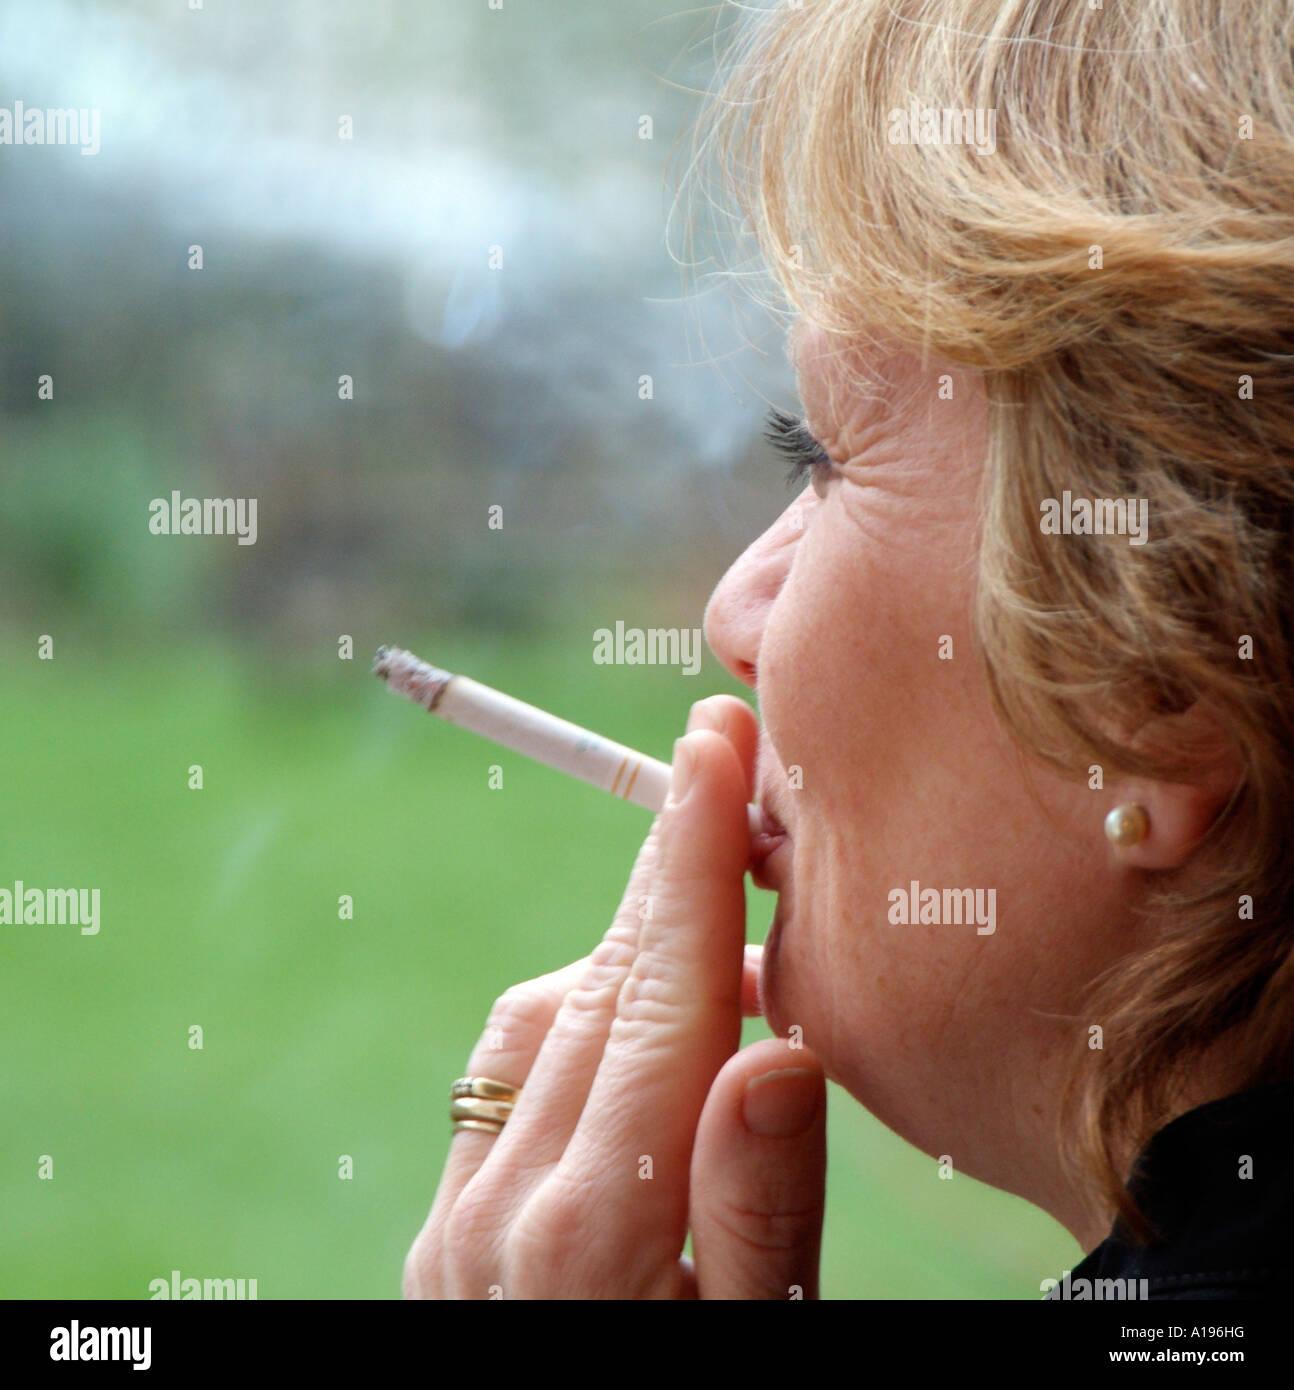 https://c1.alamy.com/compes/a196hg/mujer-fumando-un-cigarrillo-exhalando-humo-de-tabaco-a196hg.jpg